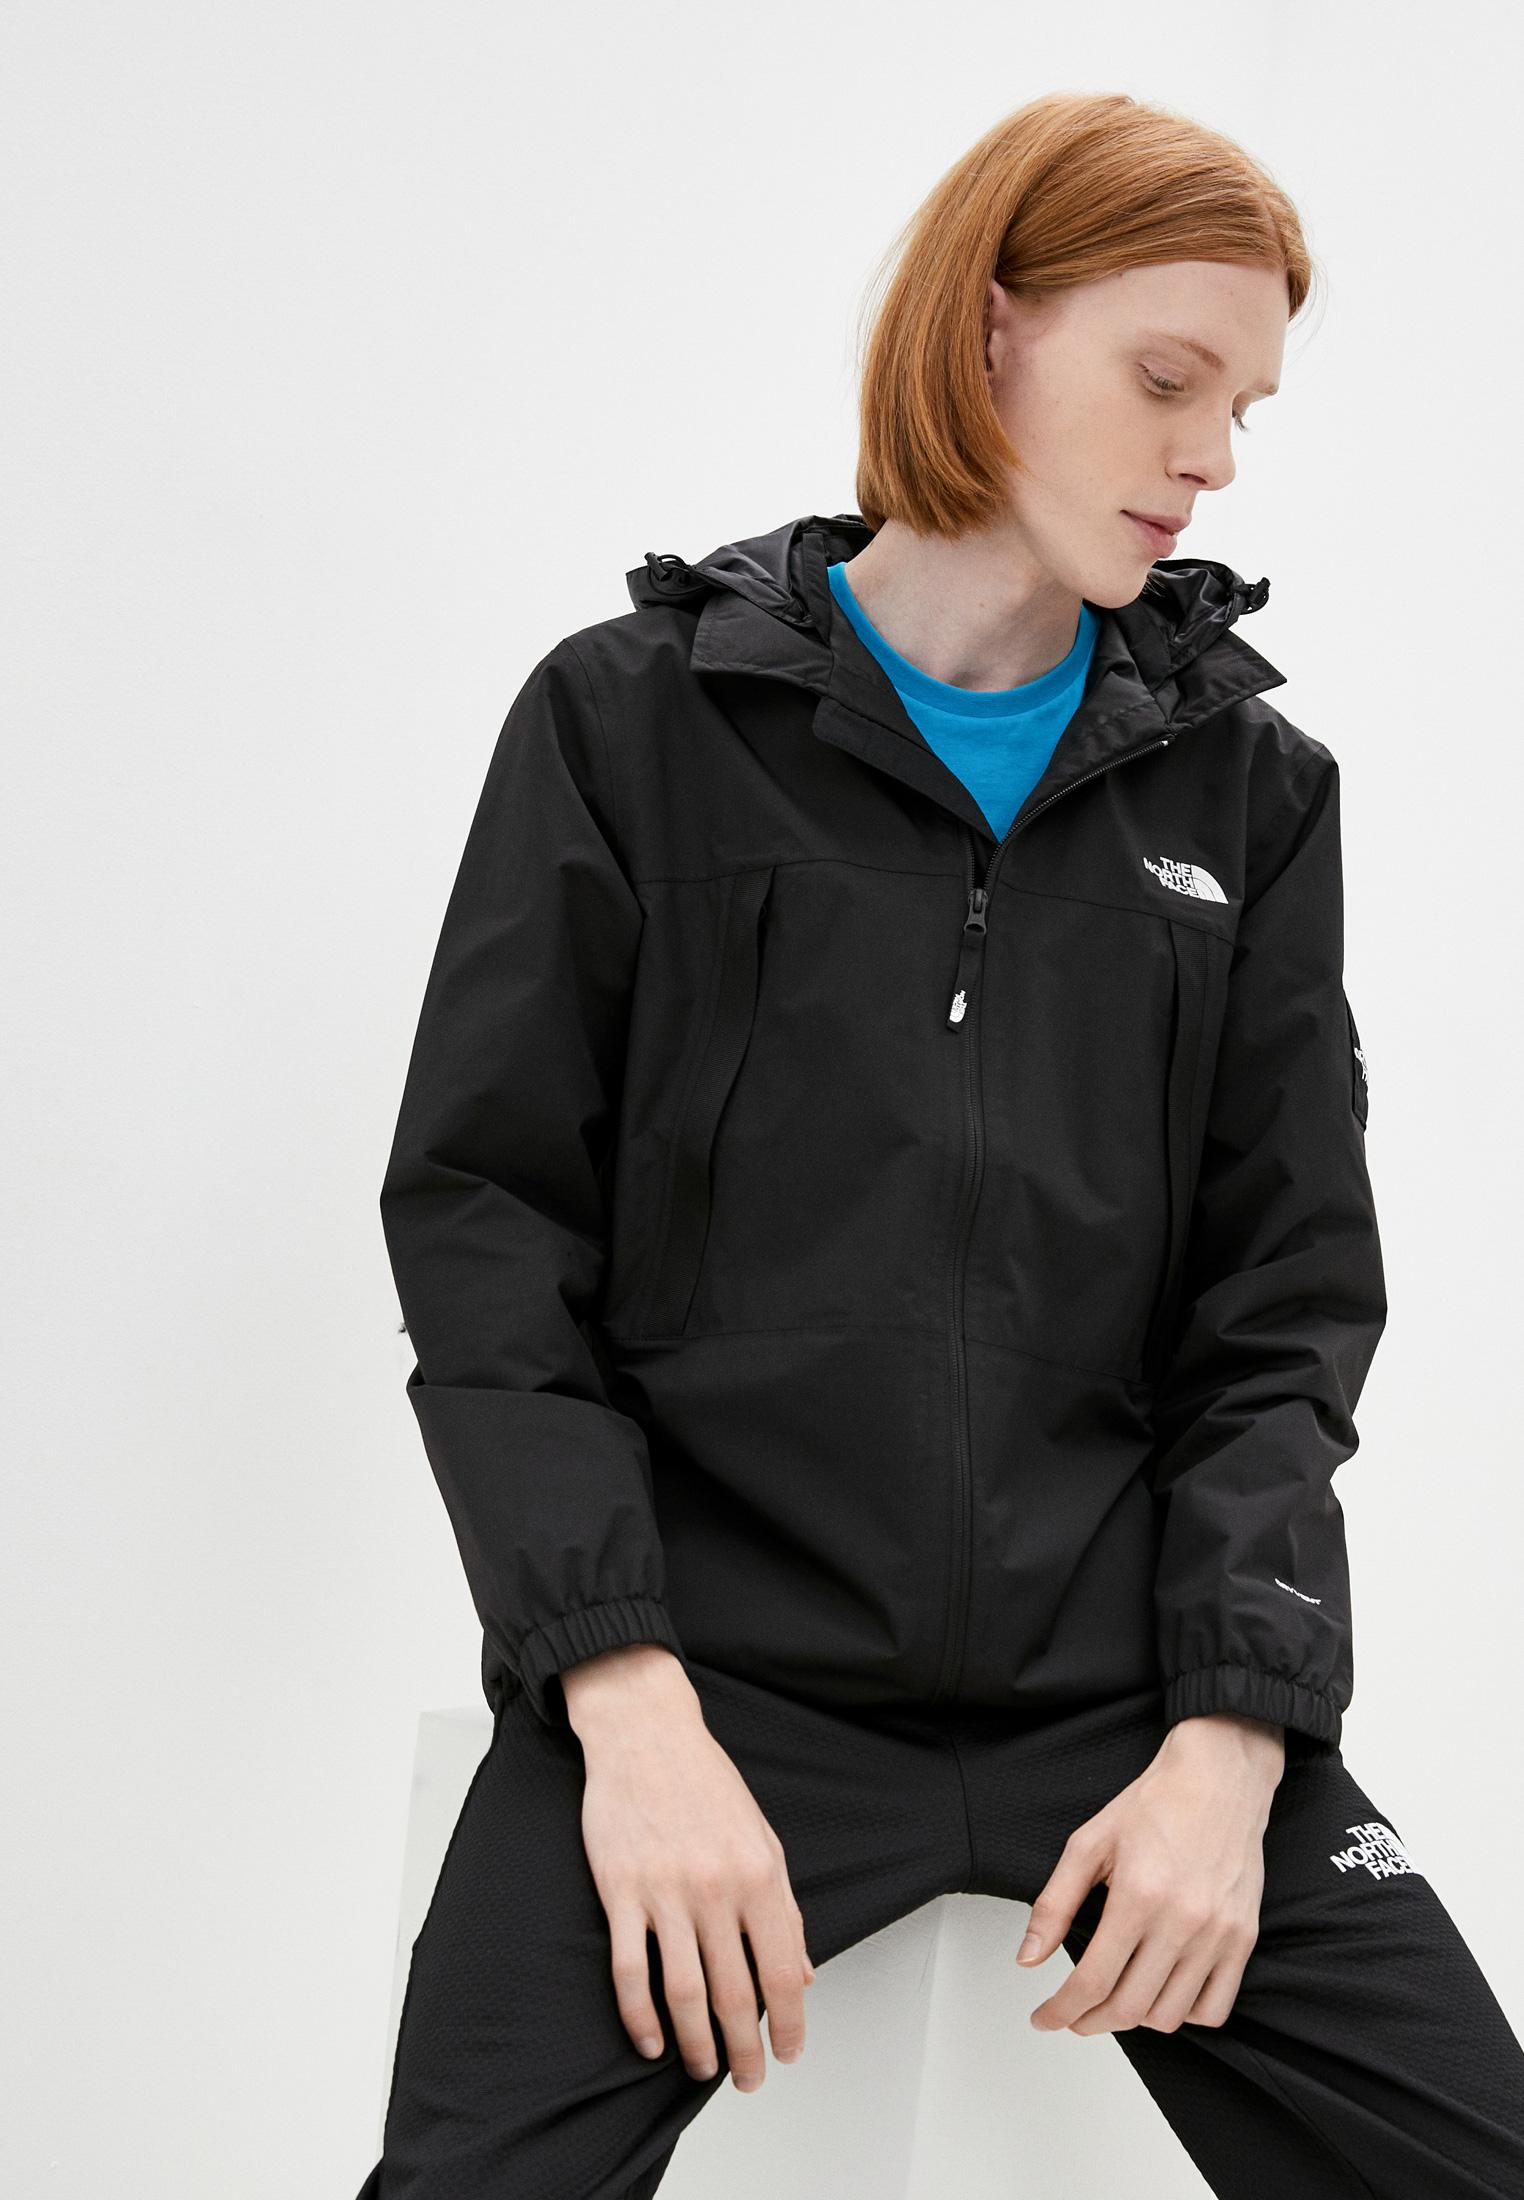 Мужская верхняя одежда The North Face (Норт Фейс) TA557D